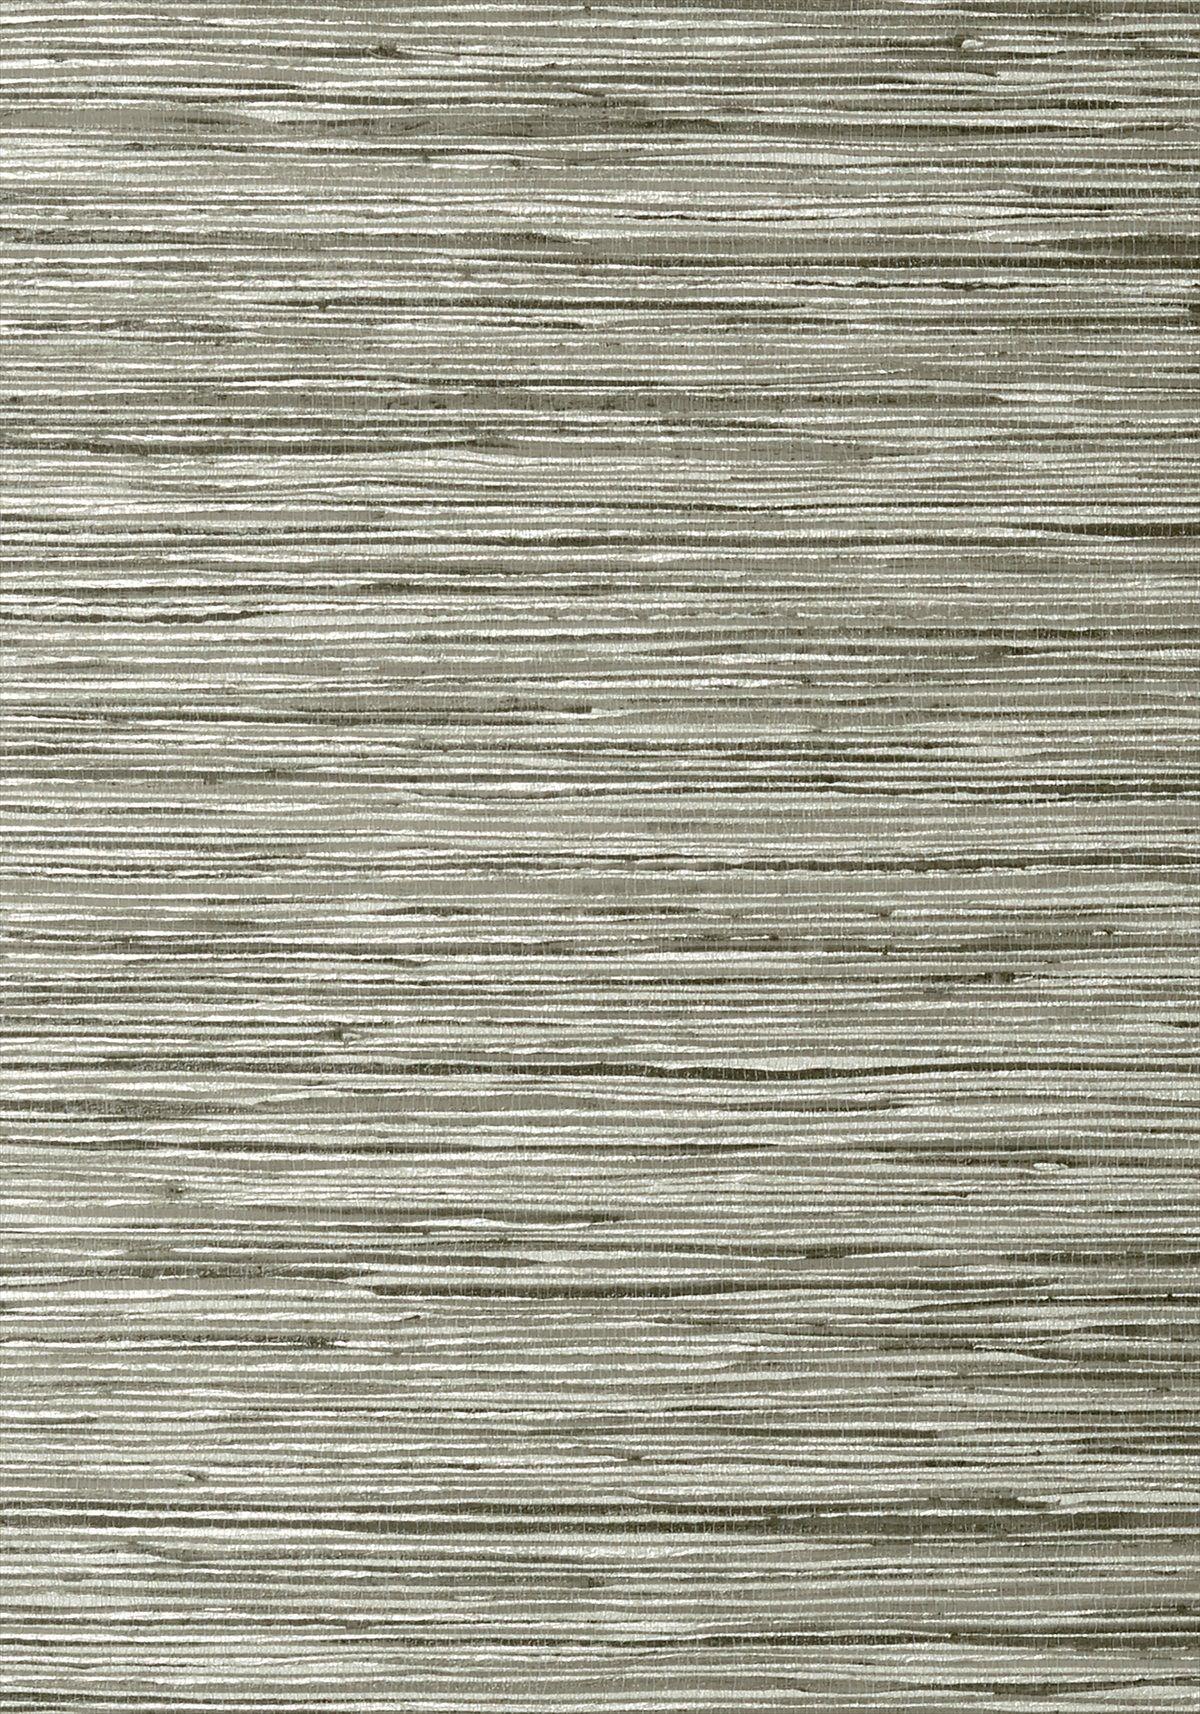 Thibaut Jindo Grass Charcoal on Metallic Silver Wallpaper